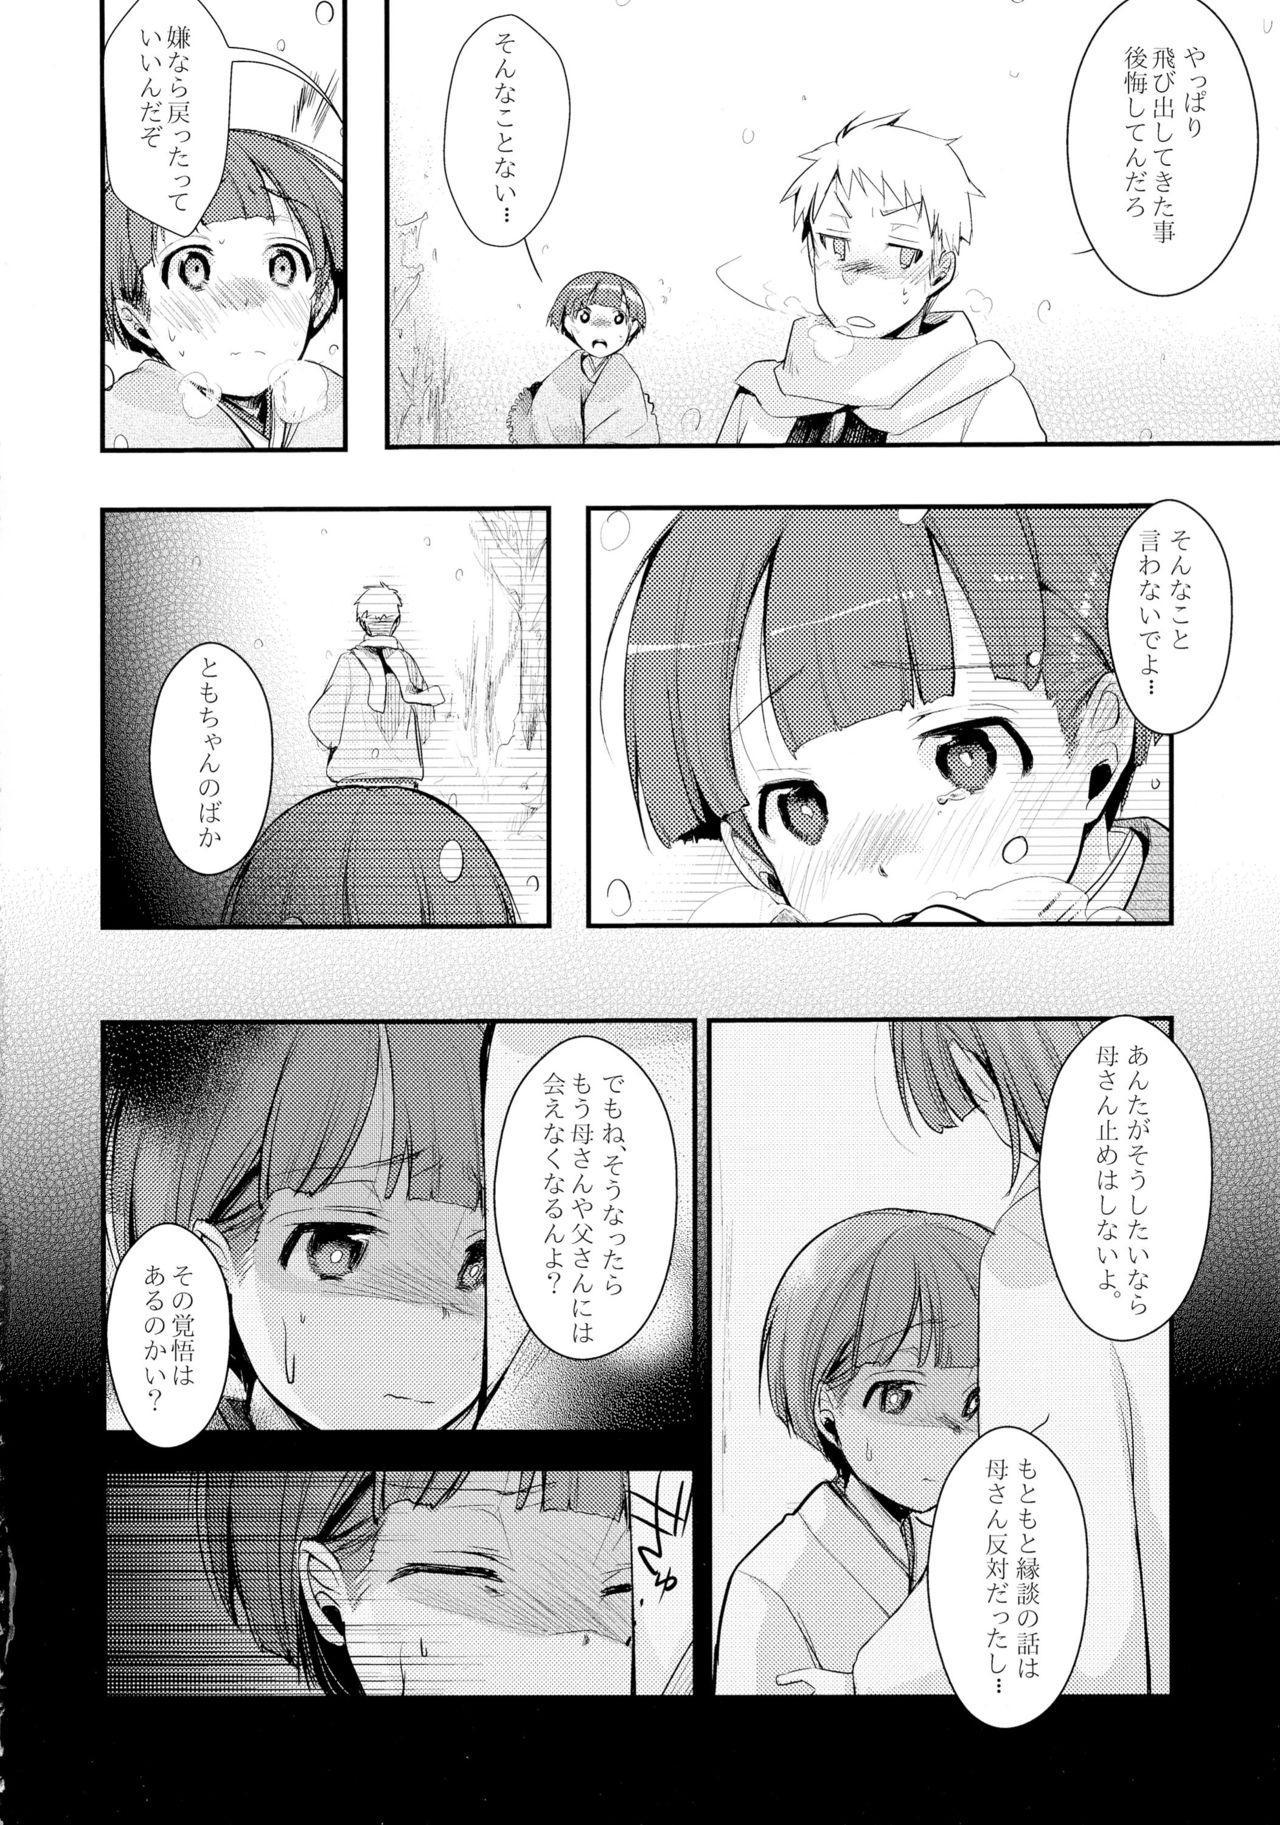 Kakeochi Shoujo Netorare 3